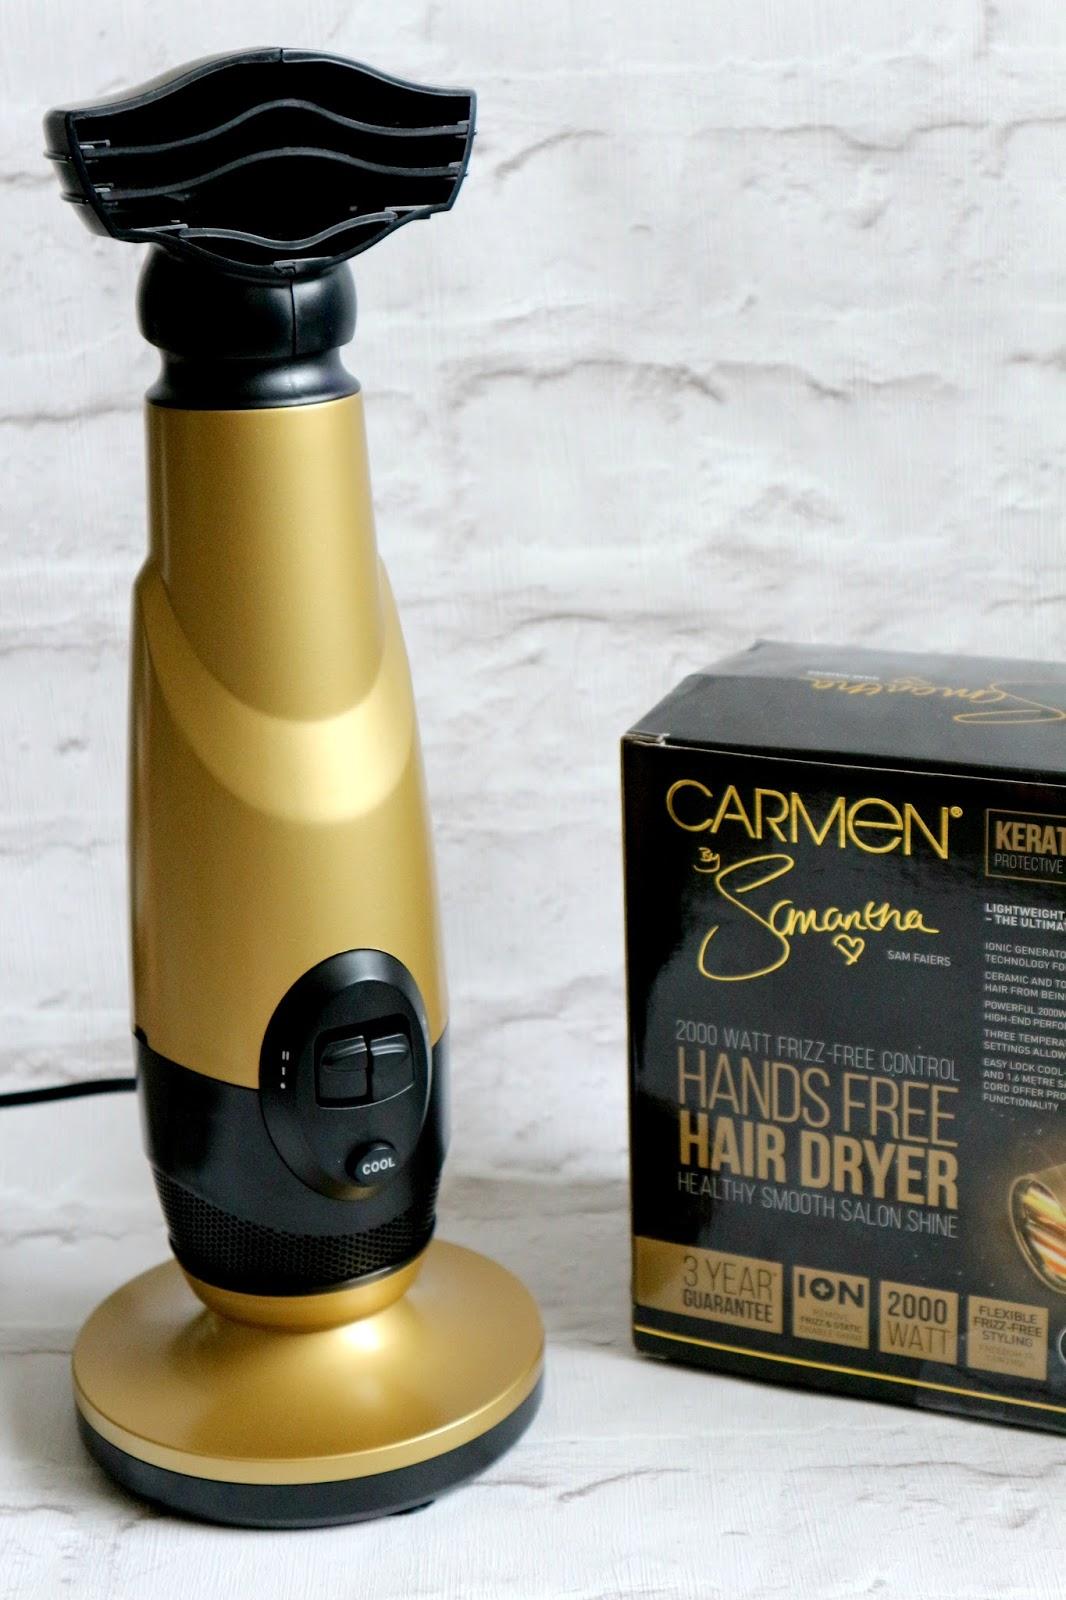 Carmen Hands Free Hairdryer